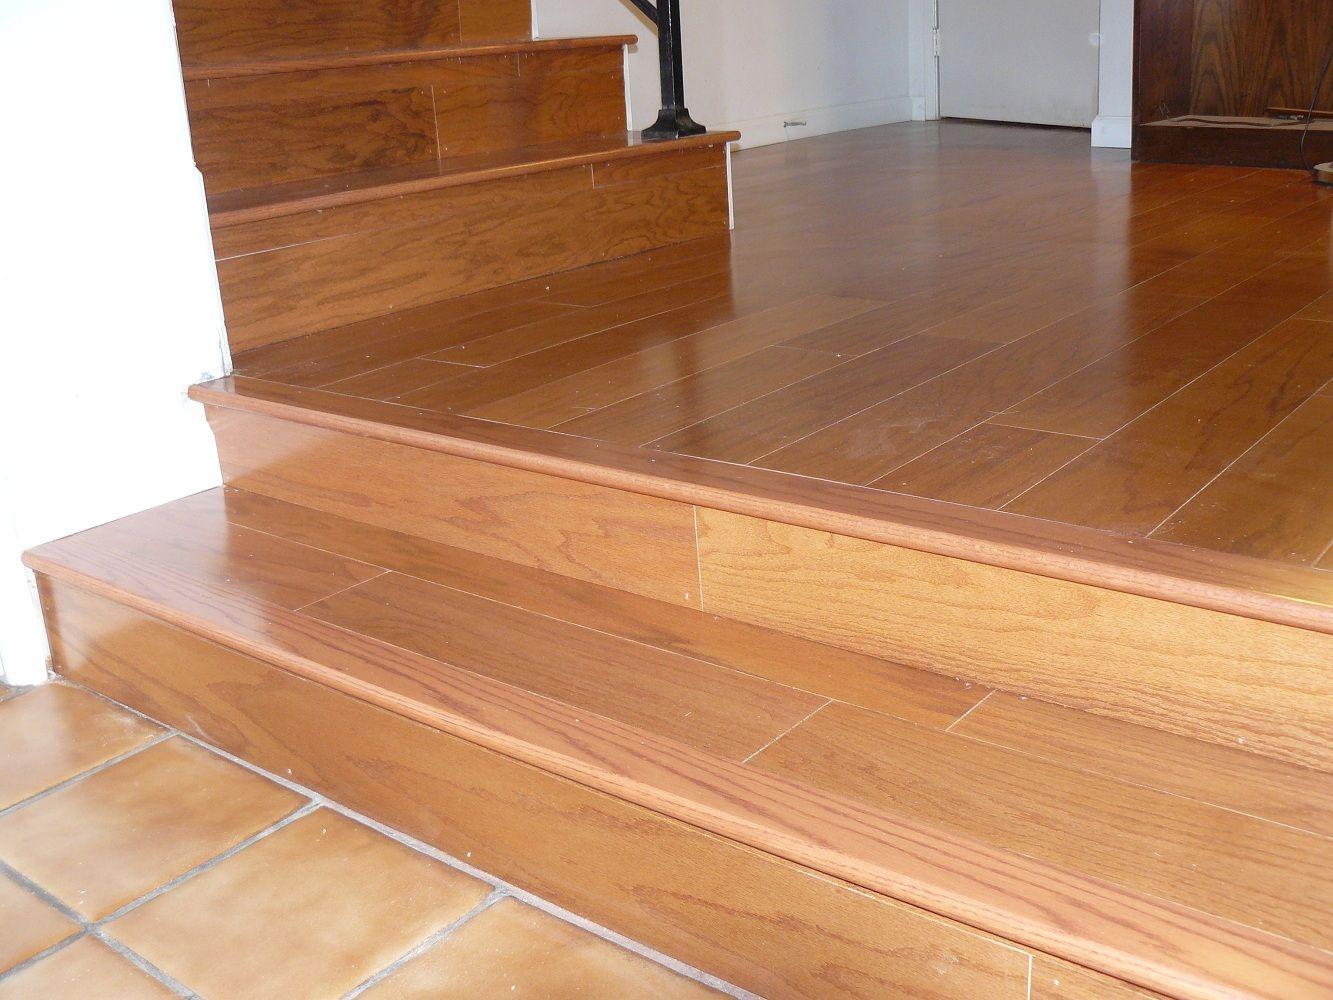 laying laminate flooring over subfloor Minimalist Home